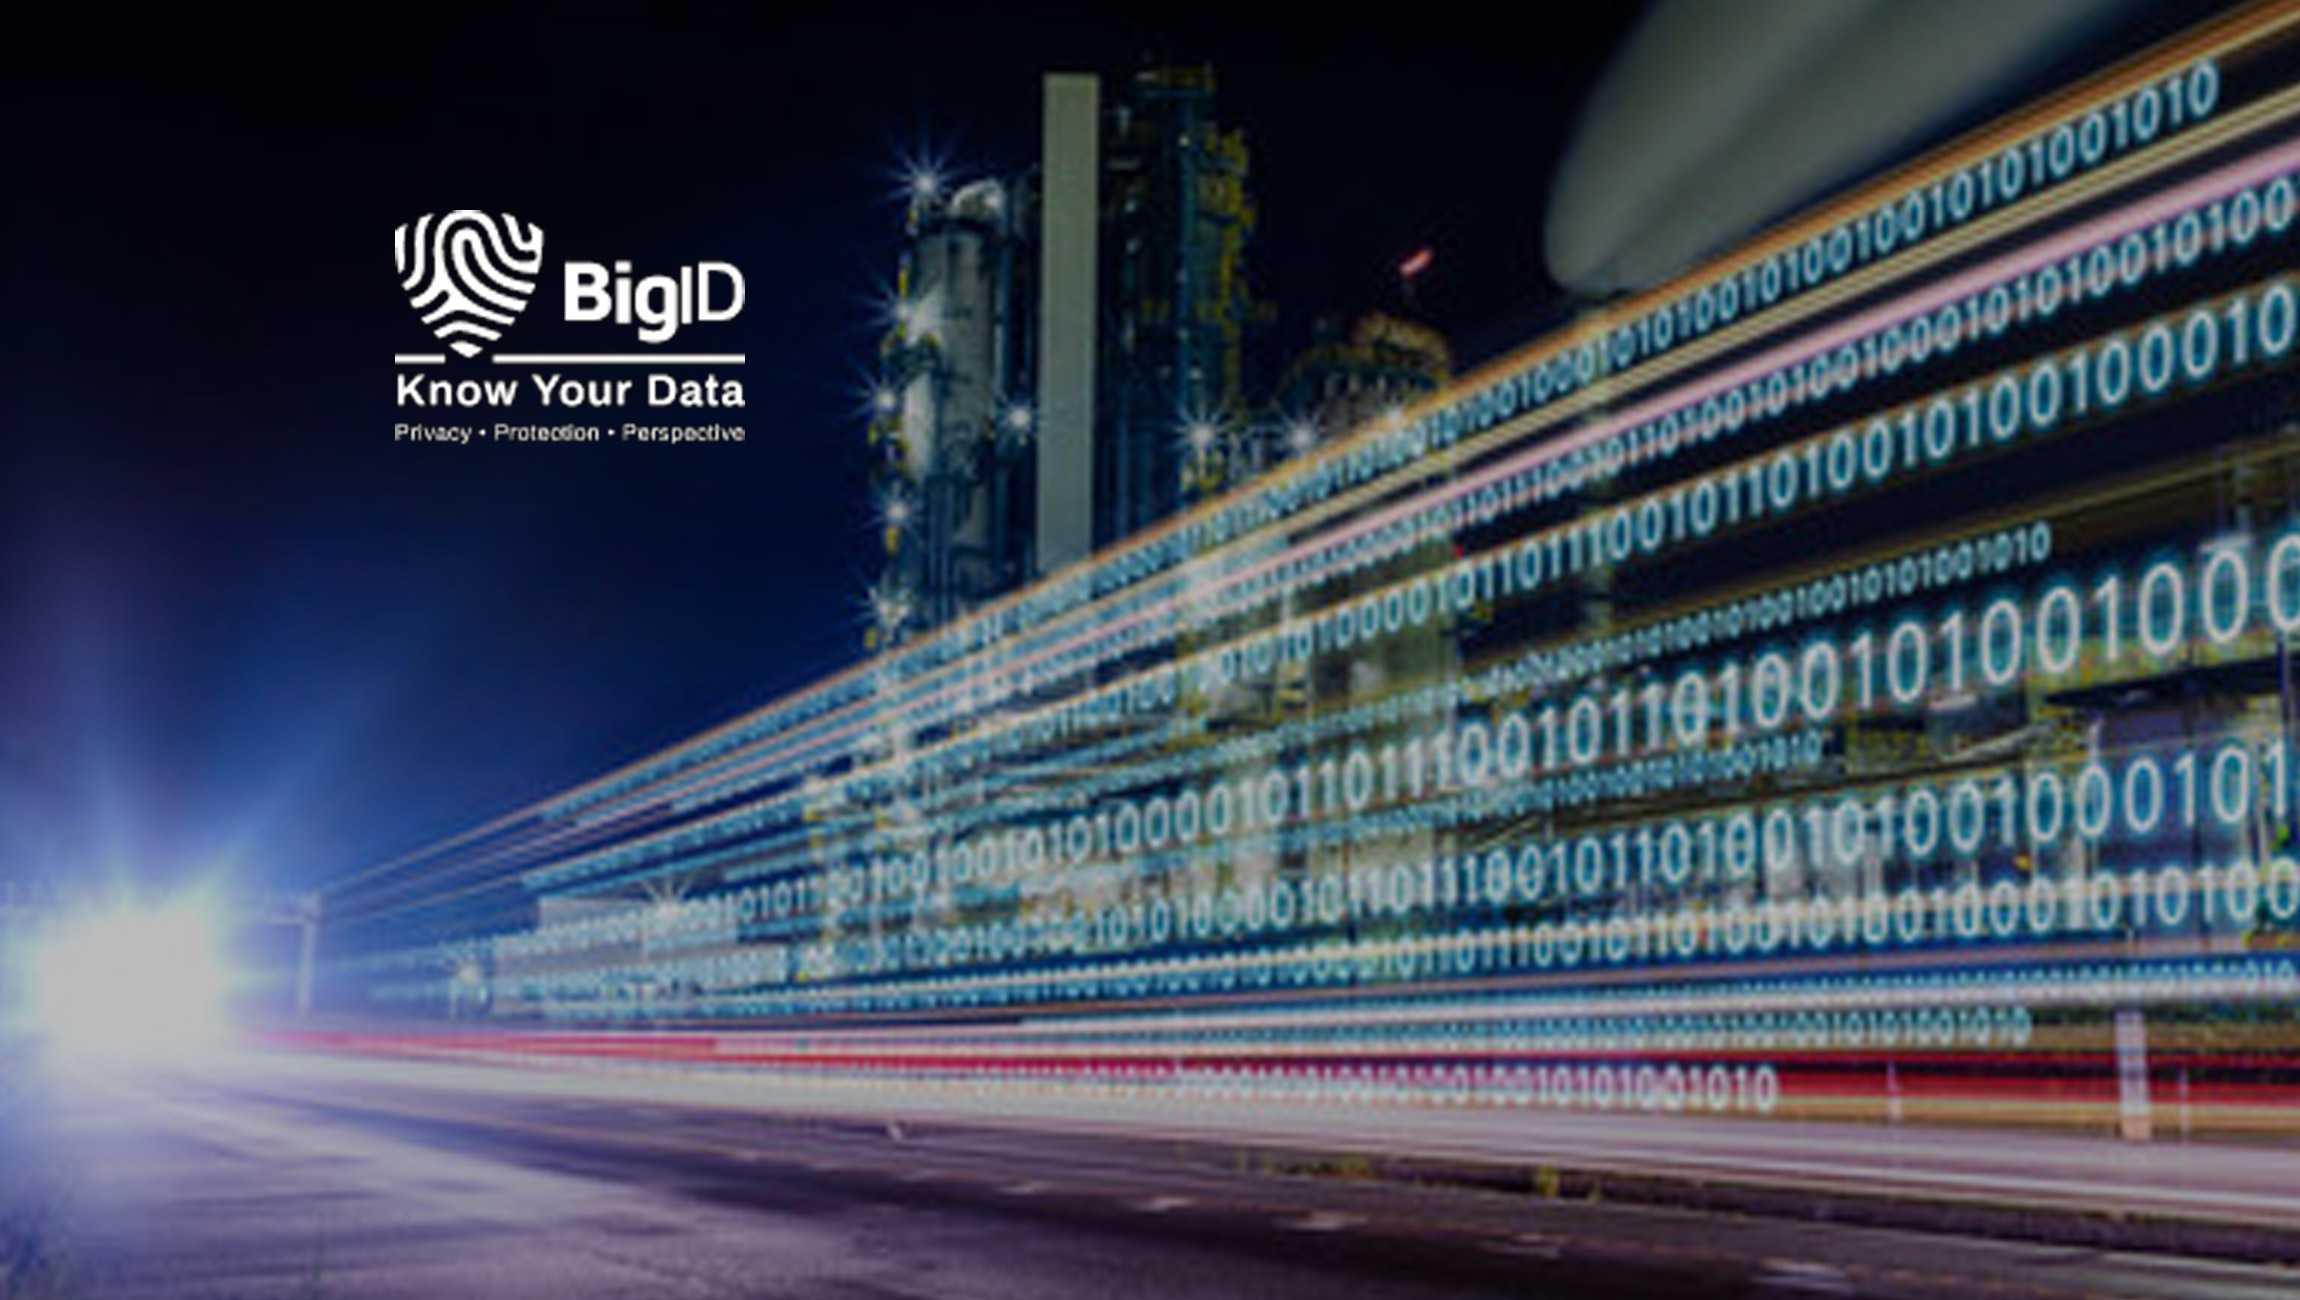 BigID Announces Next Generation Data Governance Apps For its Data Catalog and Discovery Platform